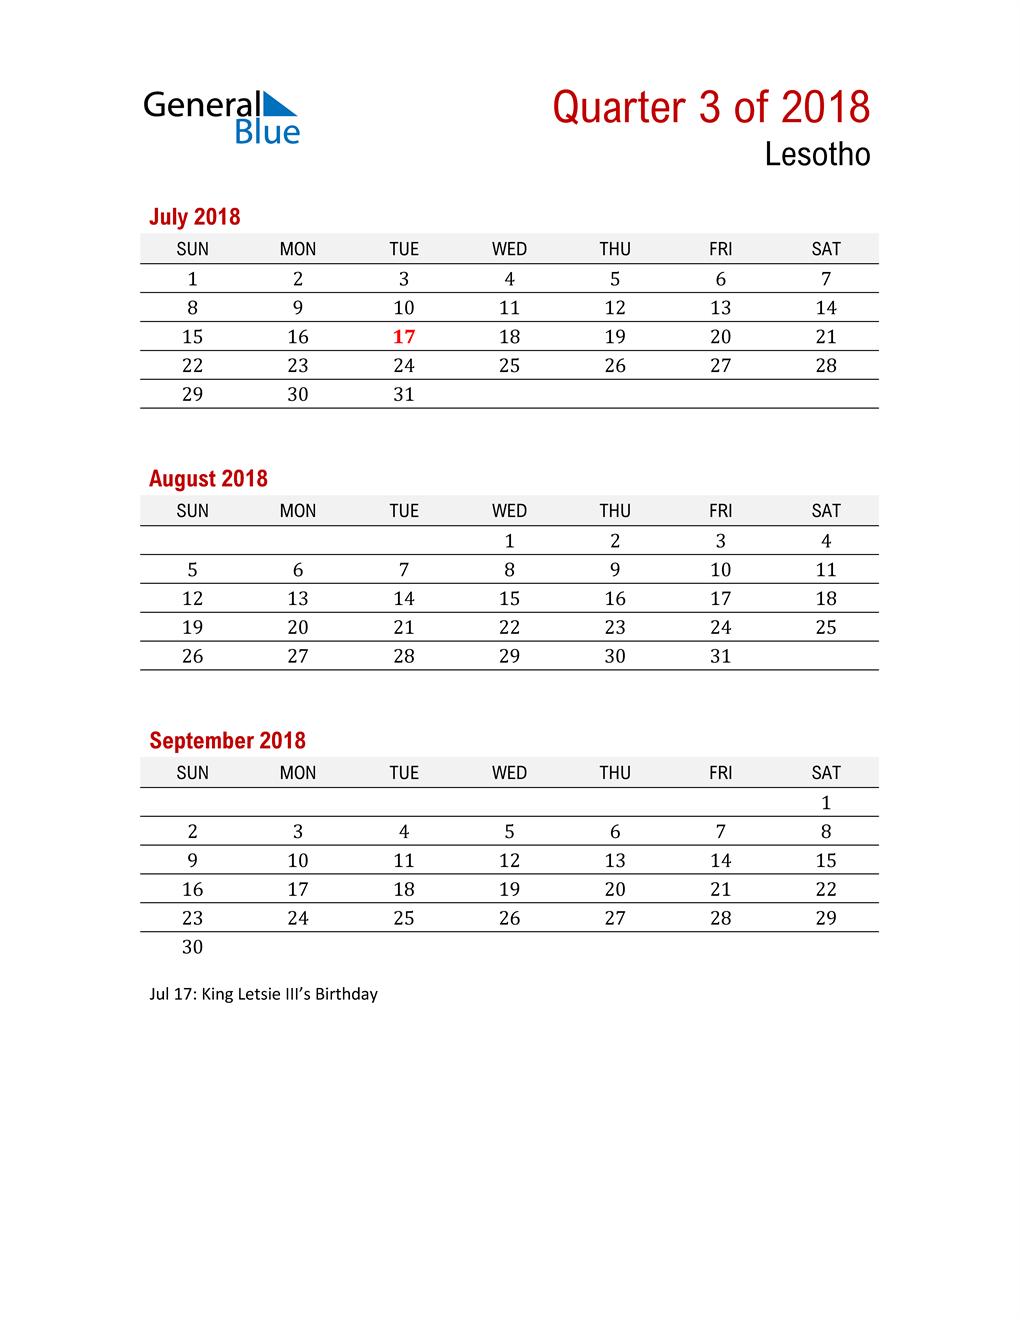 Printable Three Month Calendar for Lesotho